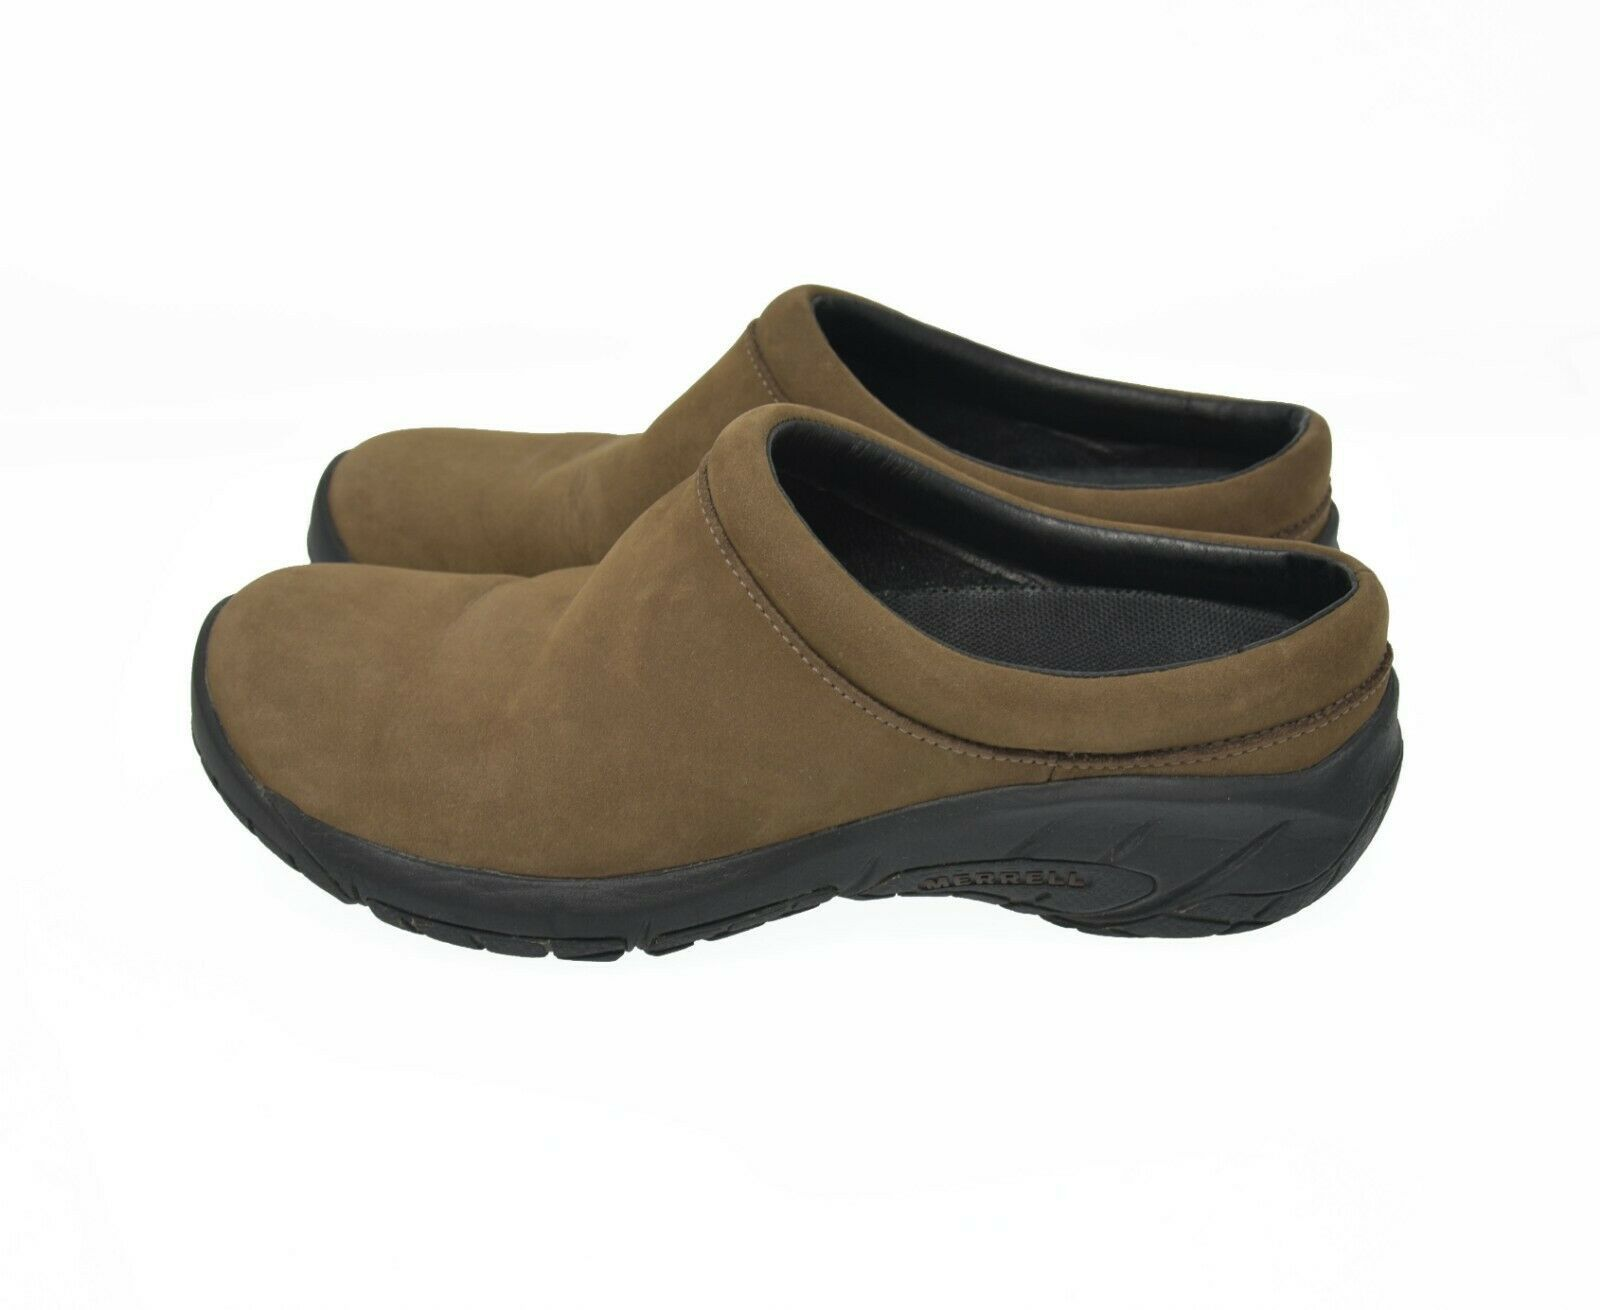 Merrell Air Cushion Women's Sz 7 EU 37.5 Brown Suede Leather Slip On Comfort